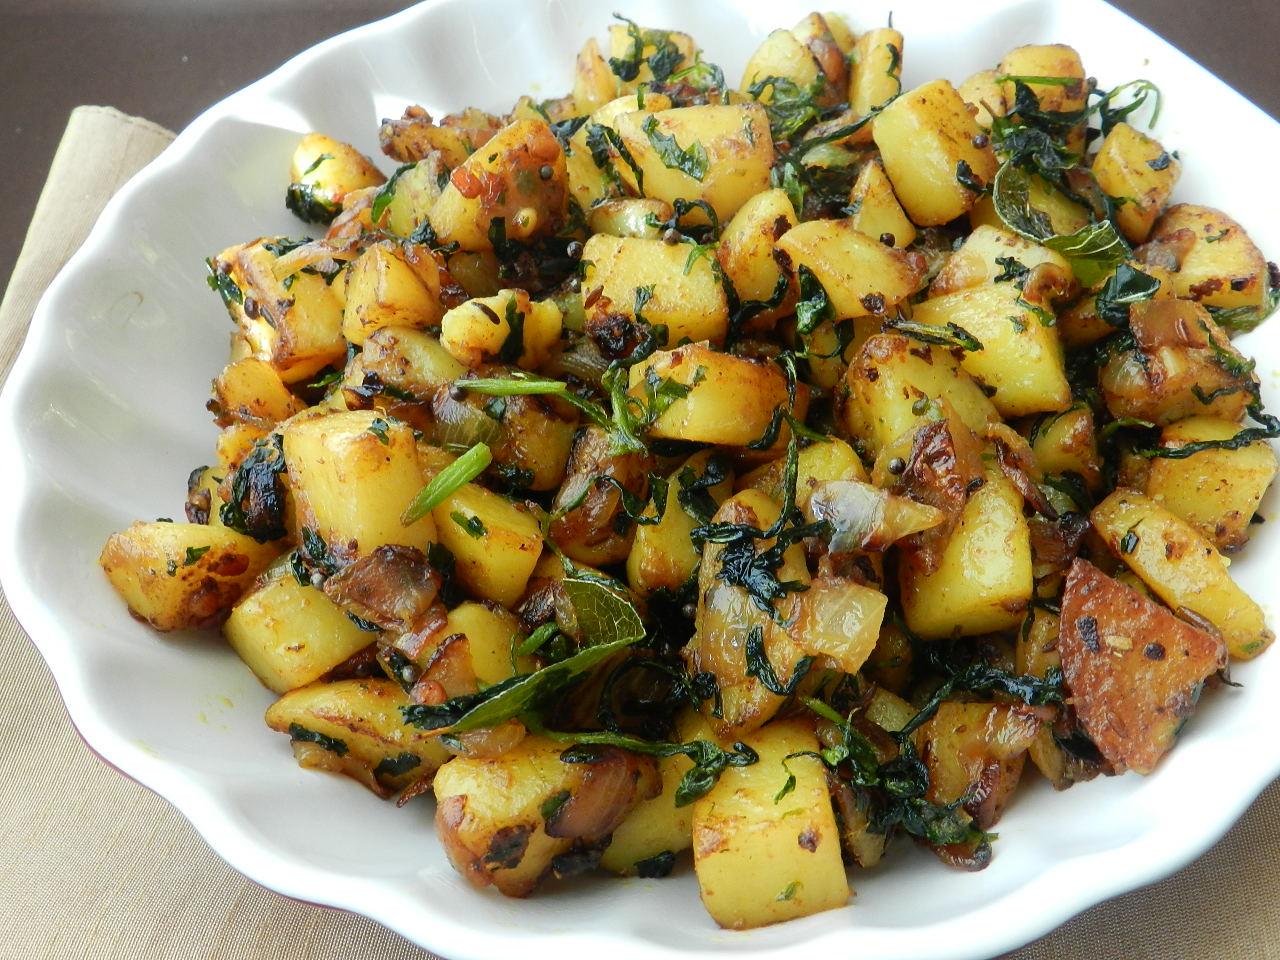 Raajis kitchen: Methi potato fry